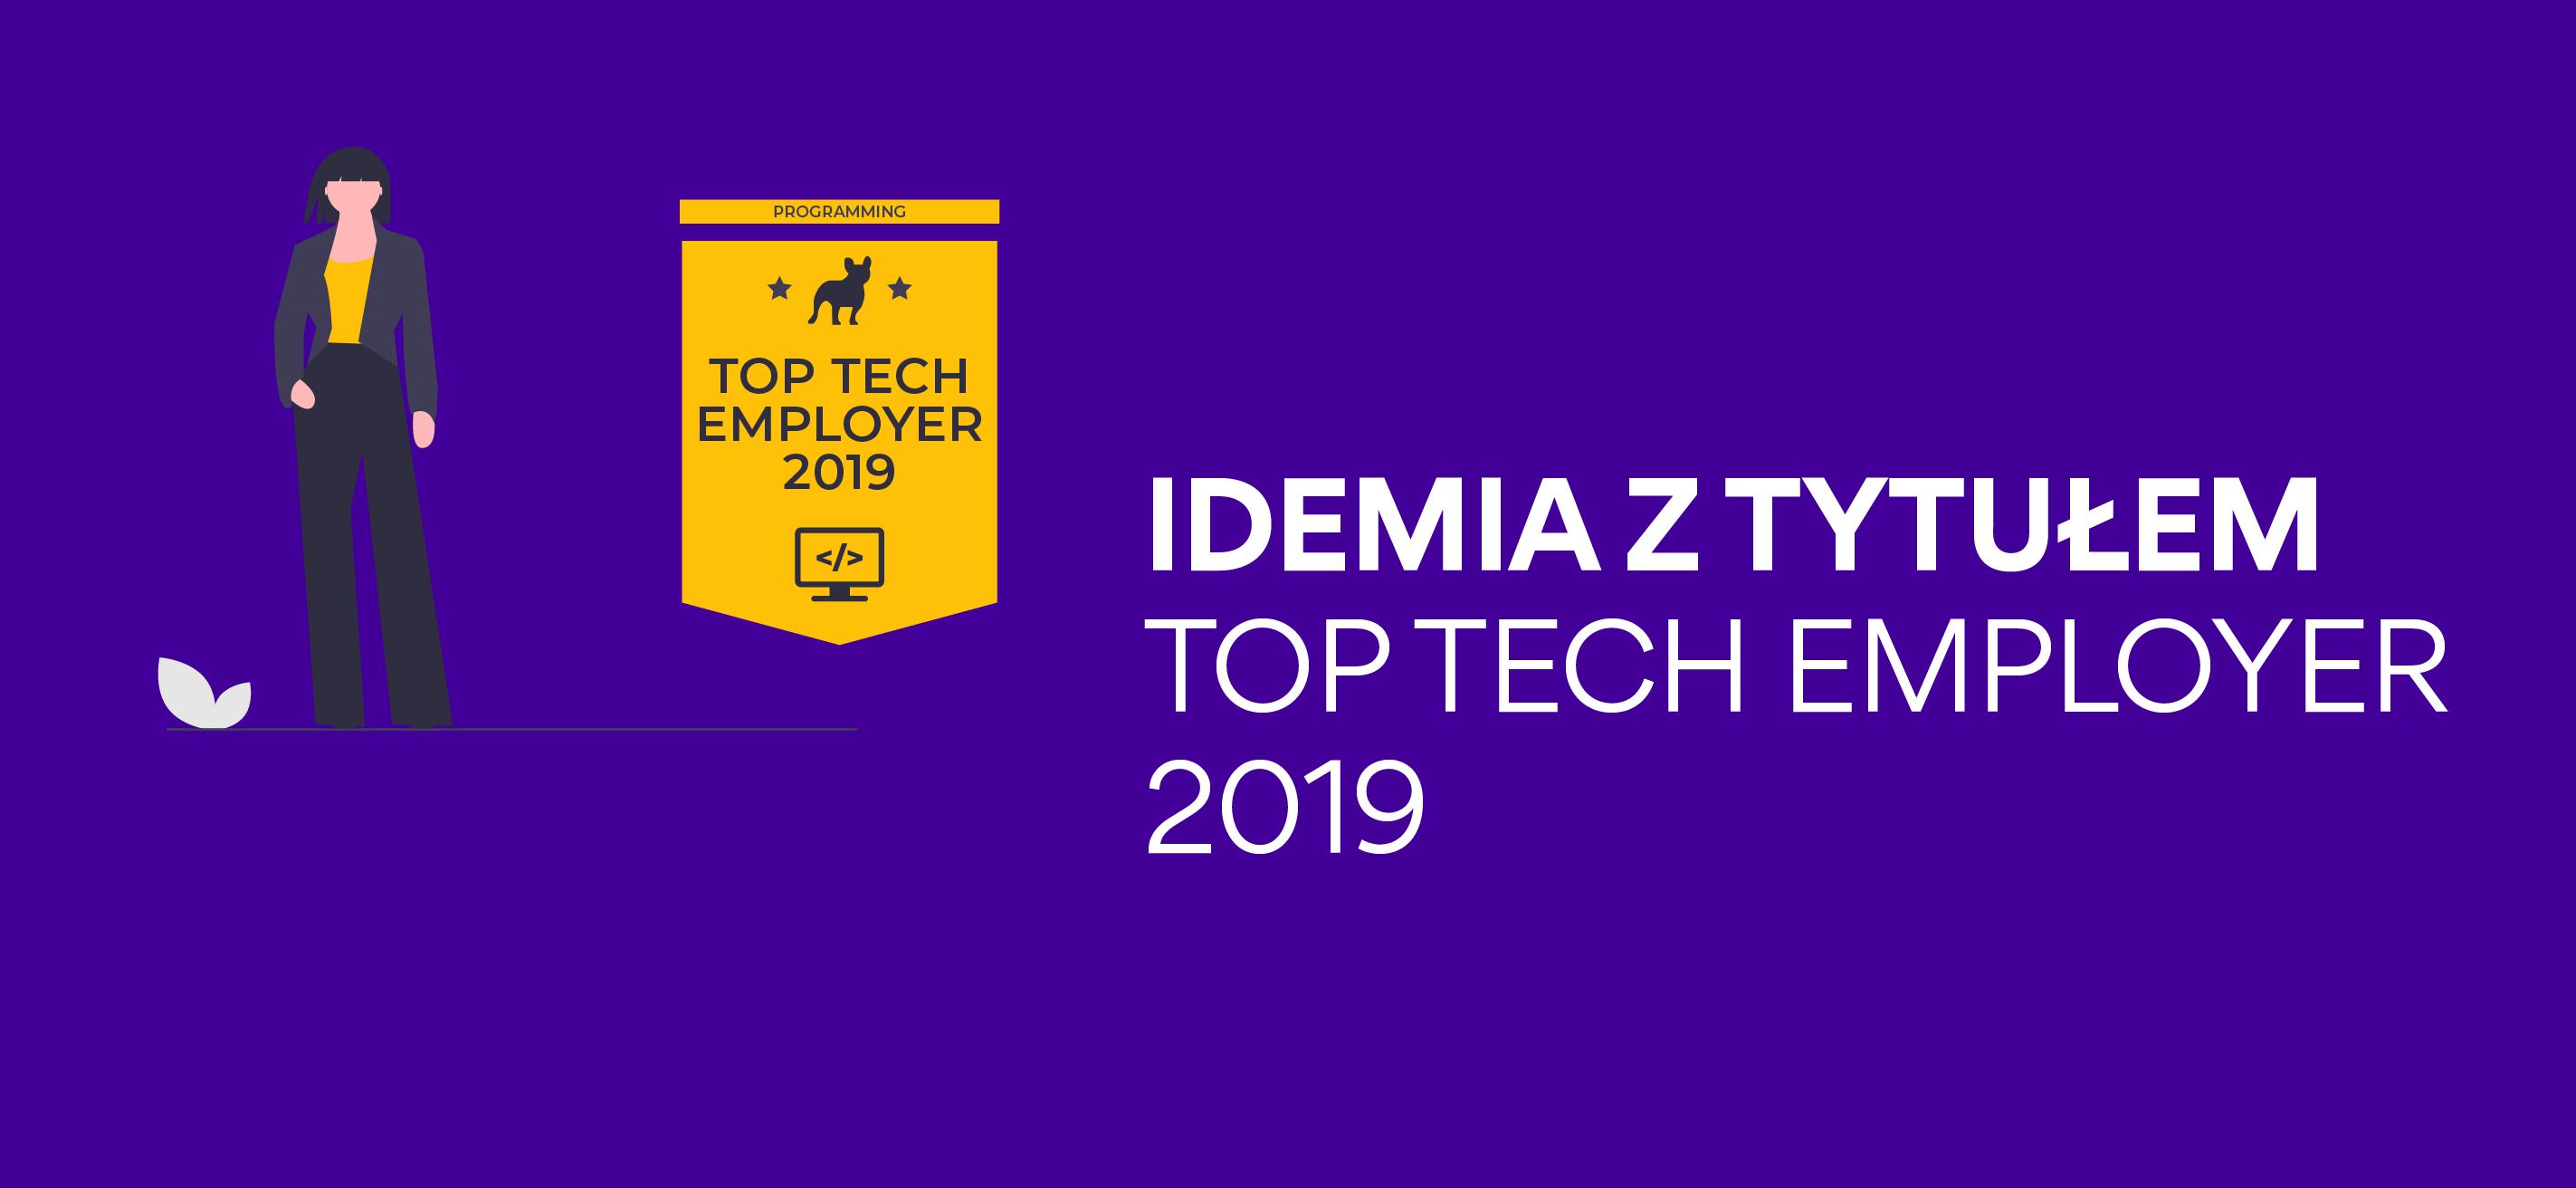 Idemia ztytułem Top Tech Employer 2019